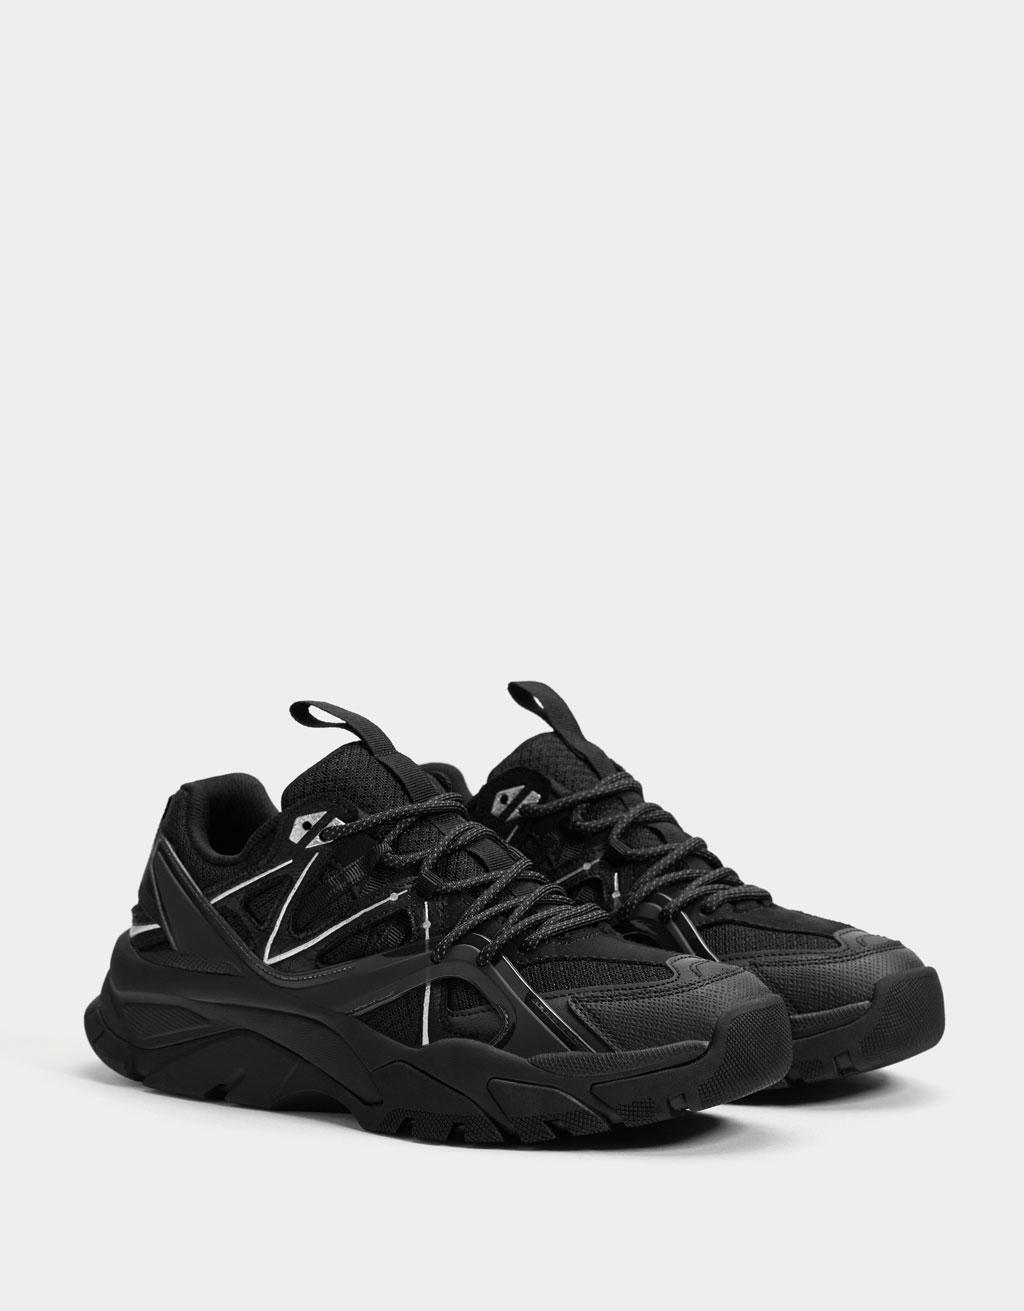 Moški funkcijski športni čevlji